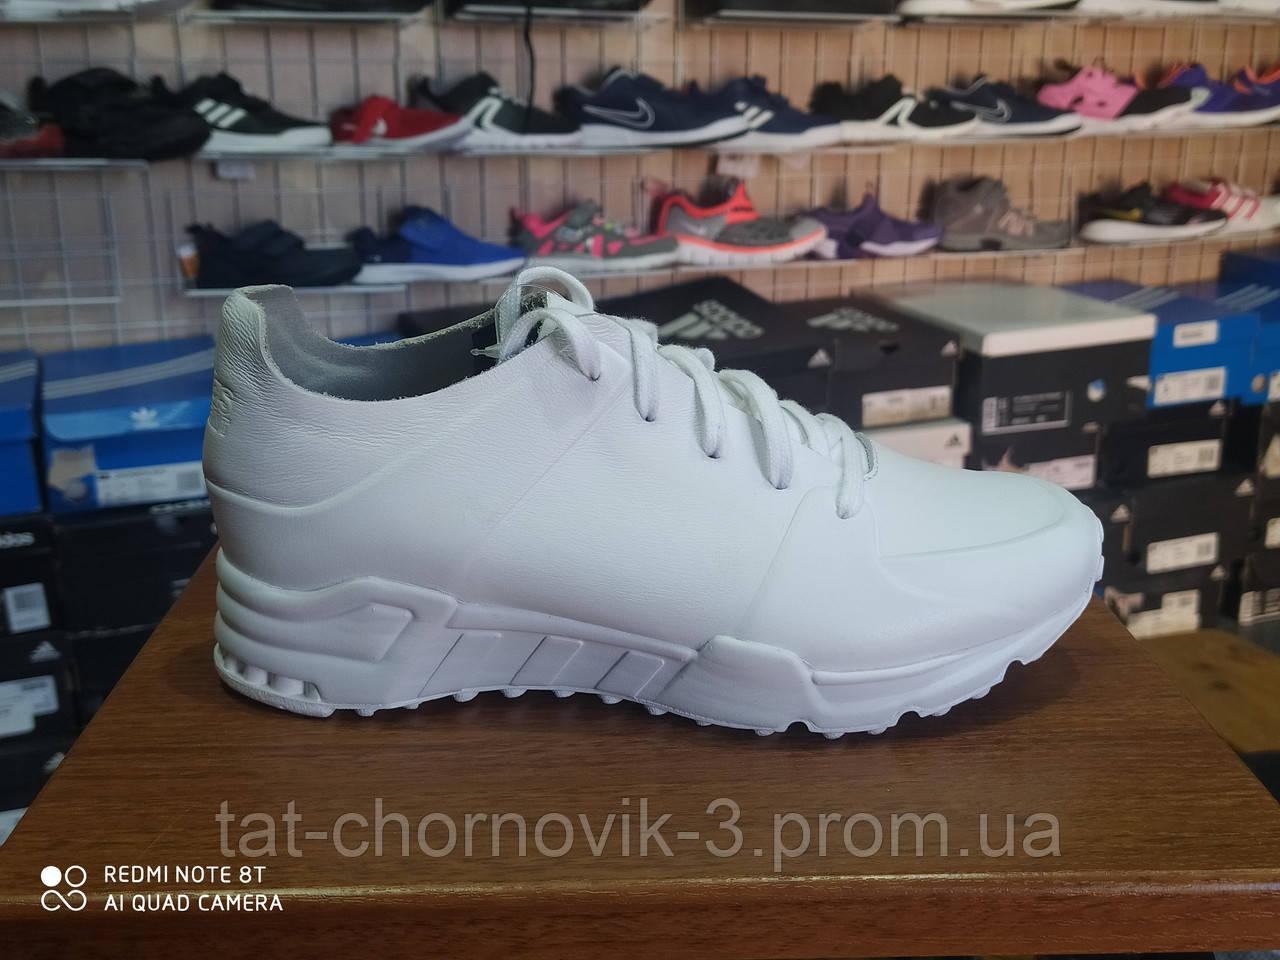 Кроссовки Adidas Equipment Support 93 NUDE S76702